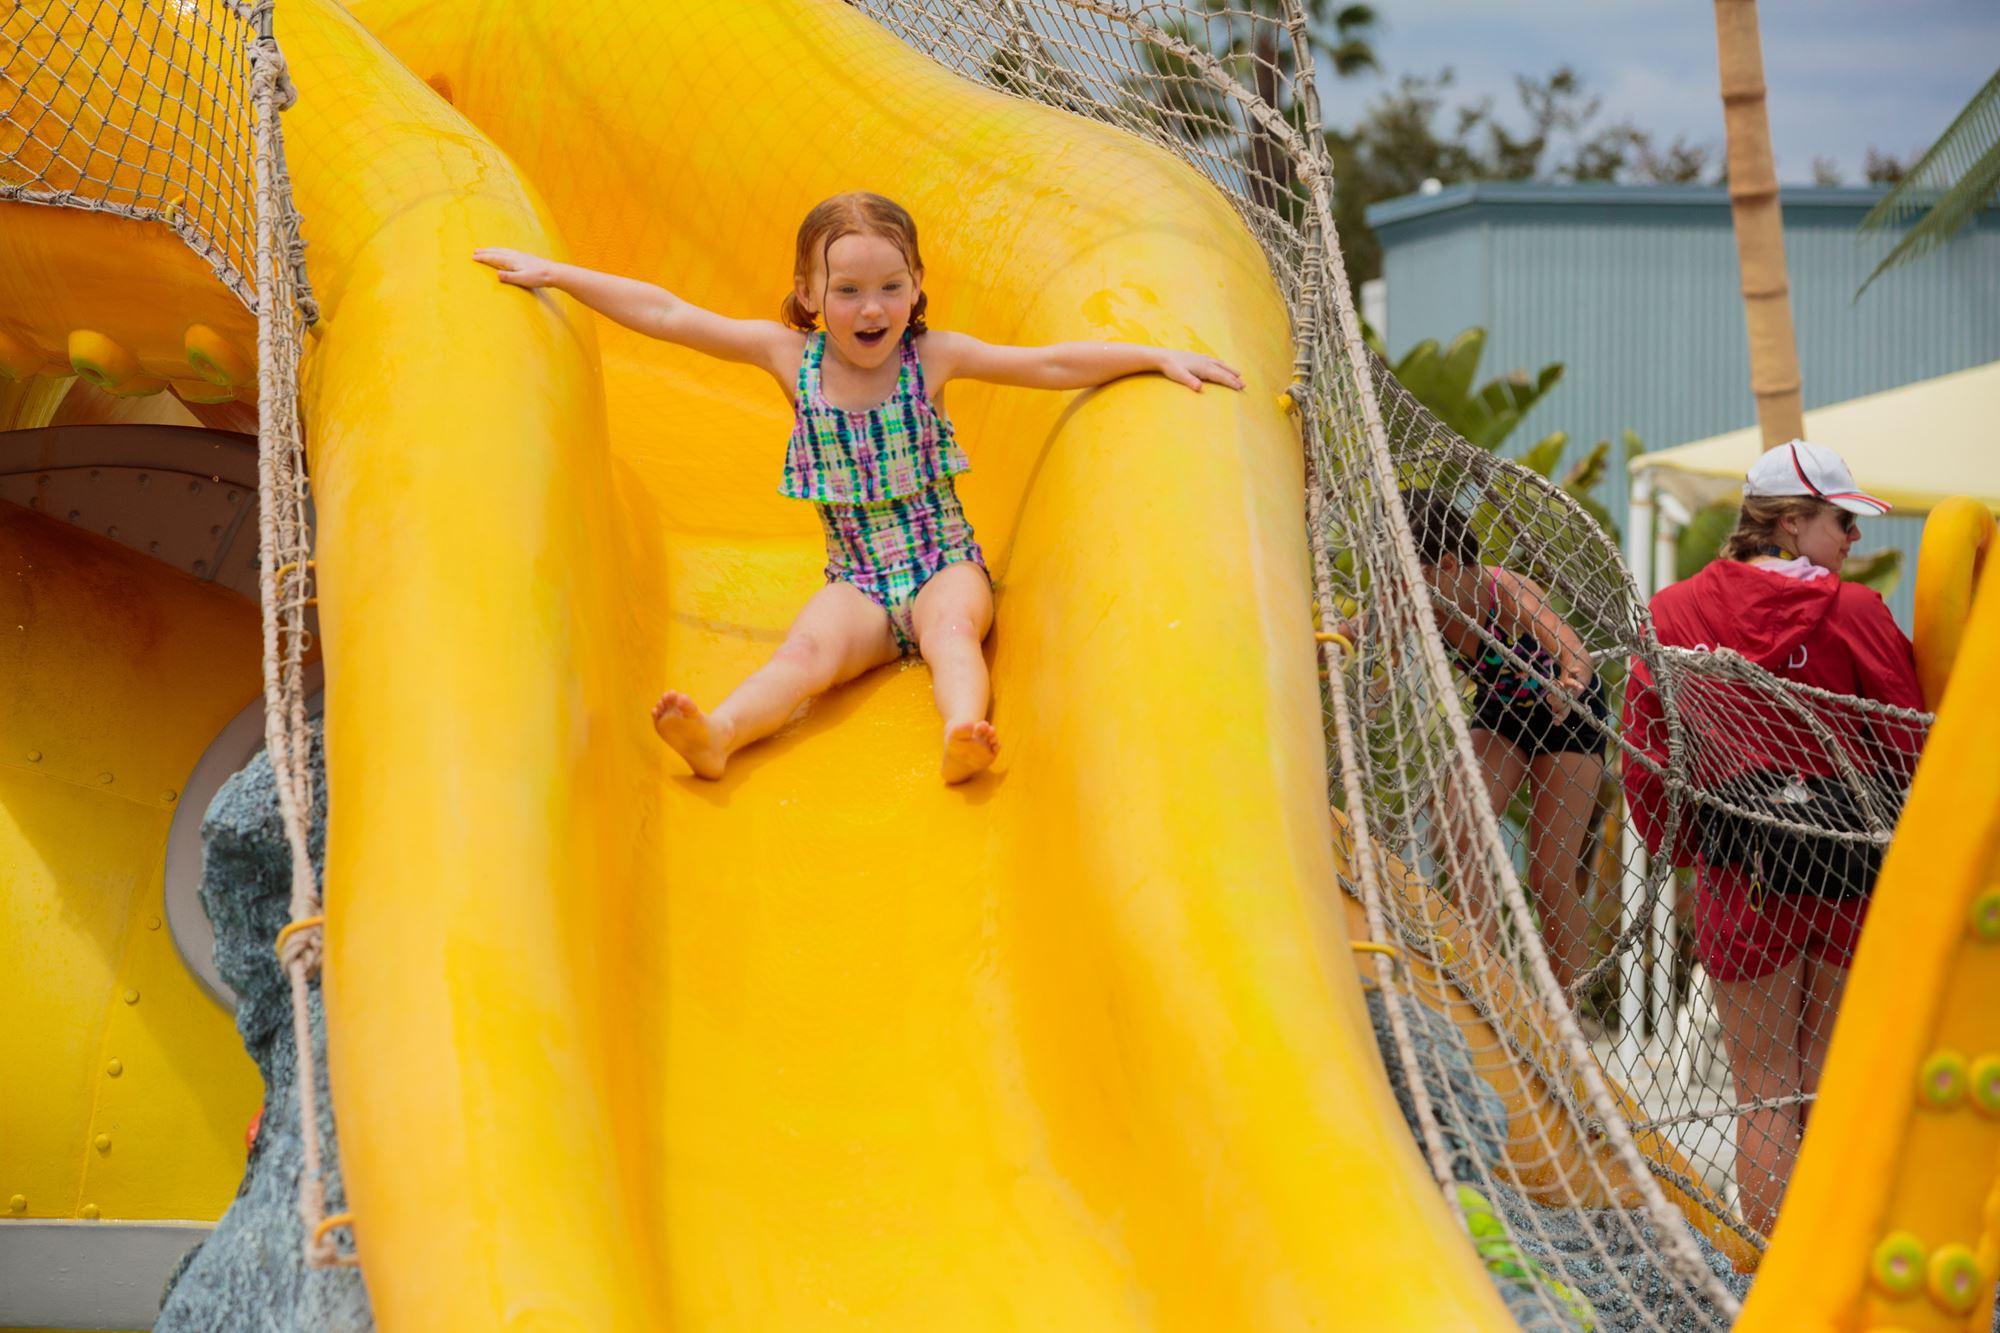 Girl on slide at Knott's Soak City in Buena Park, CA